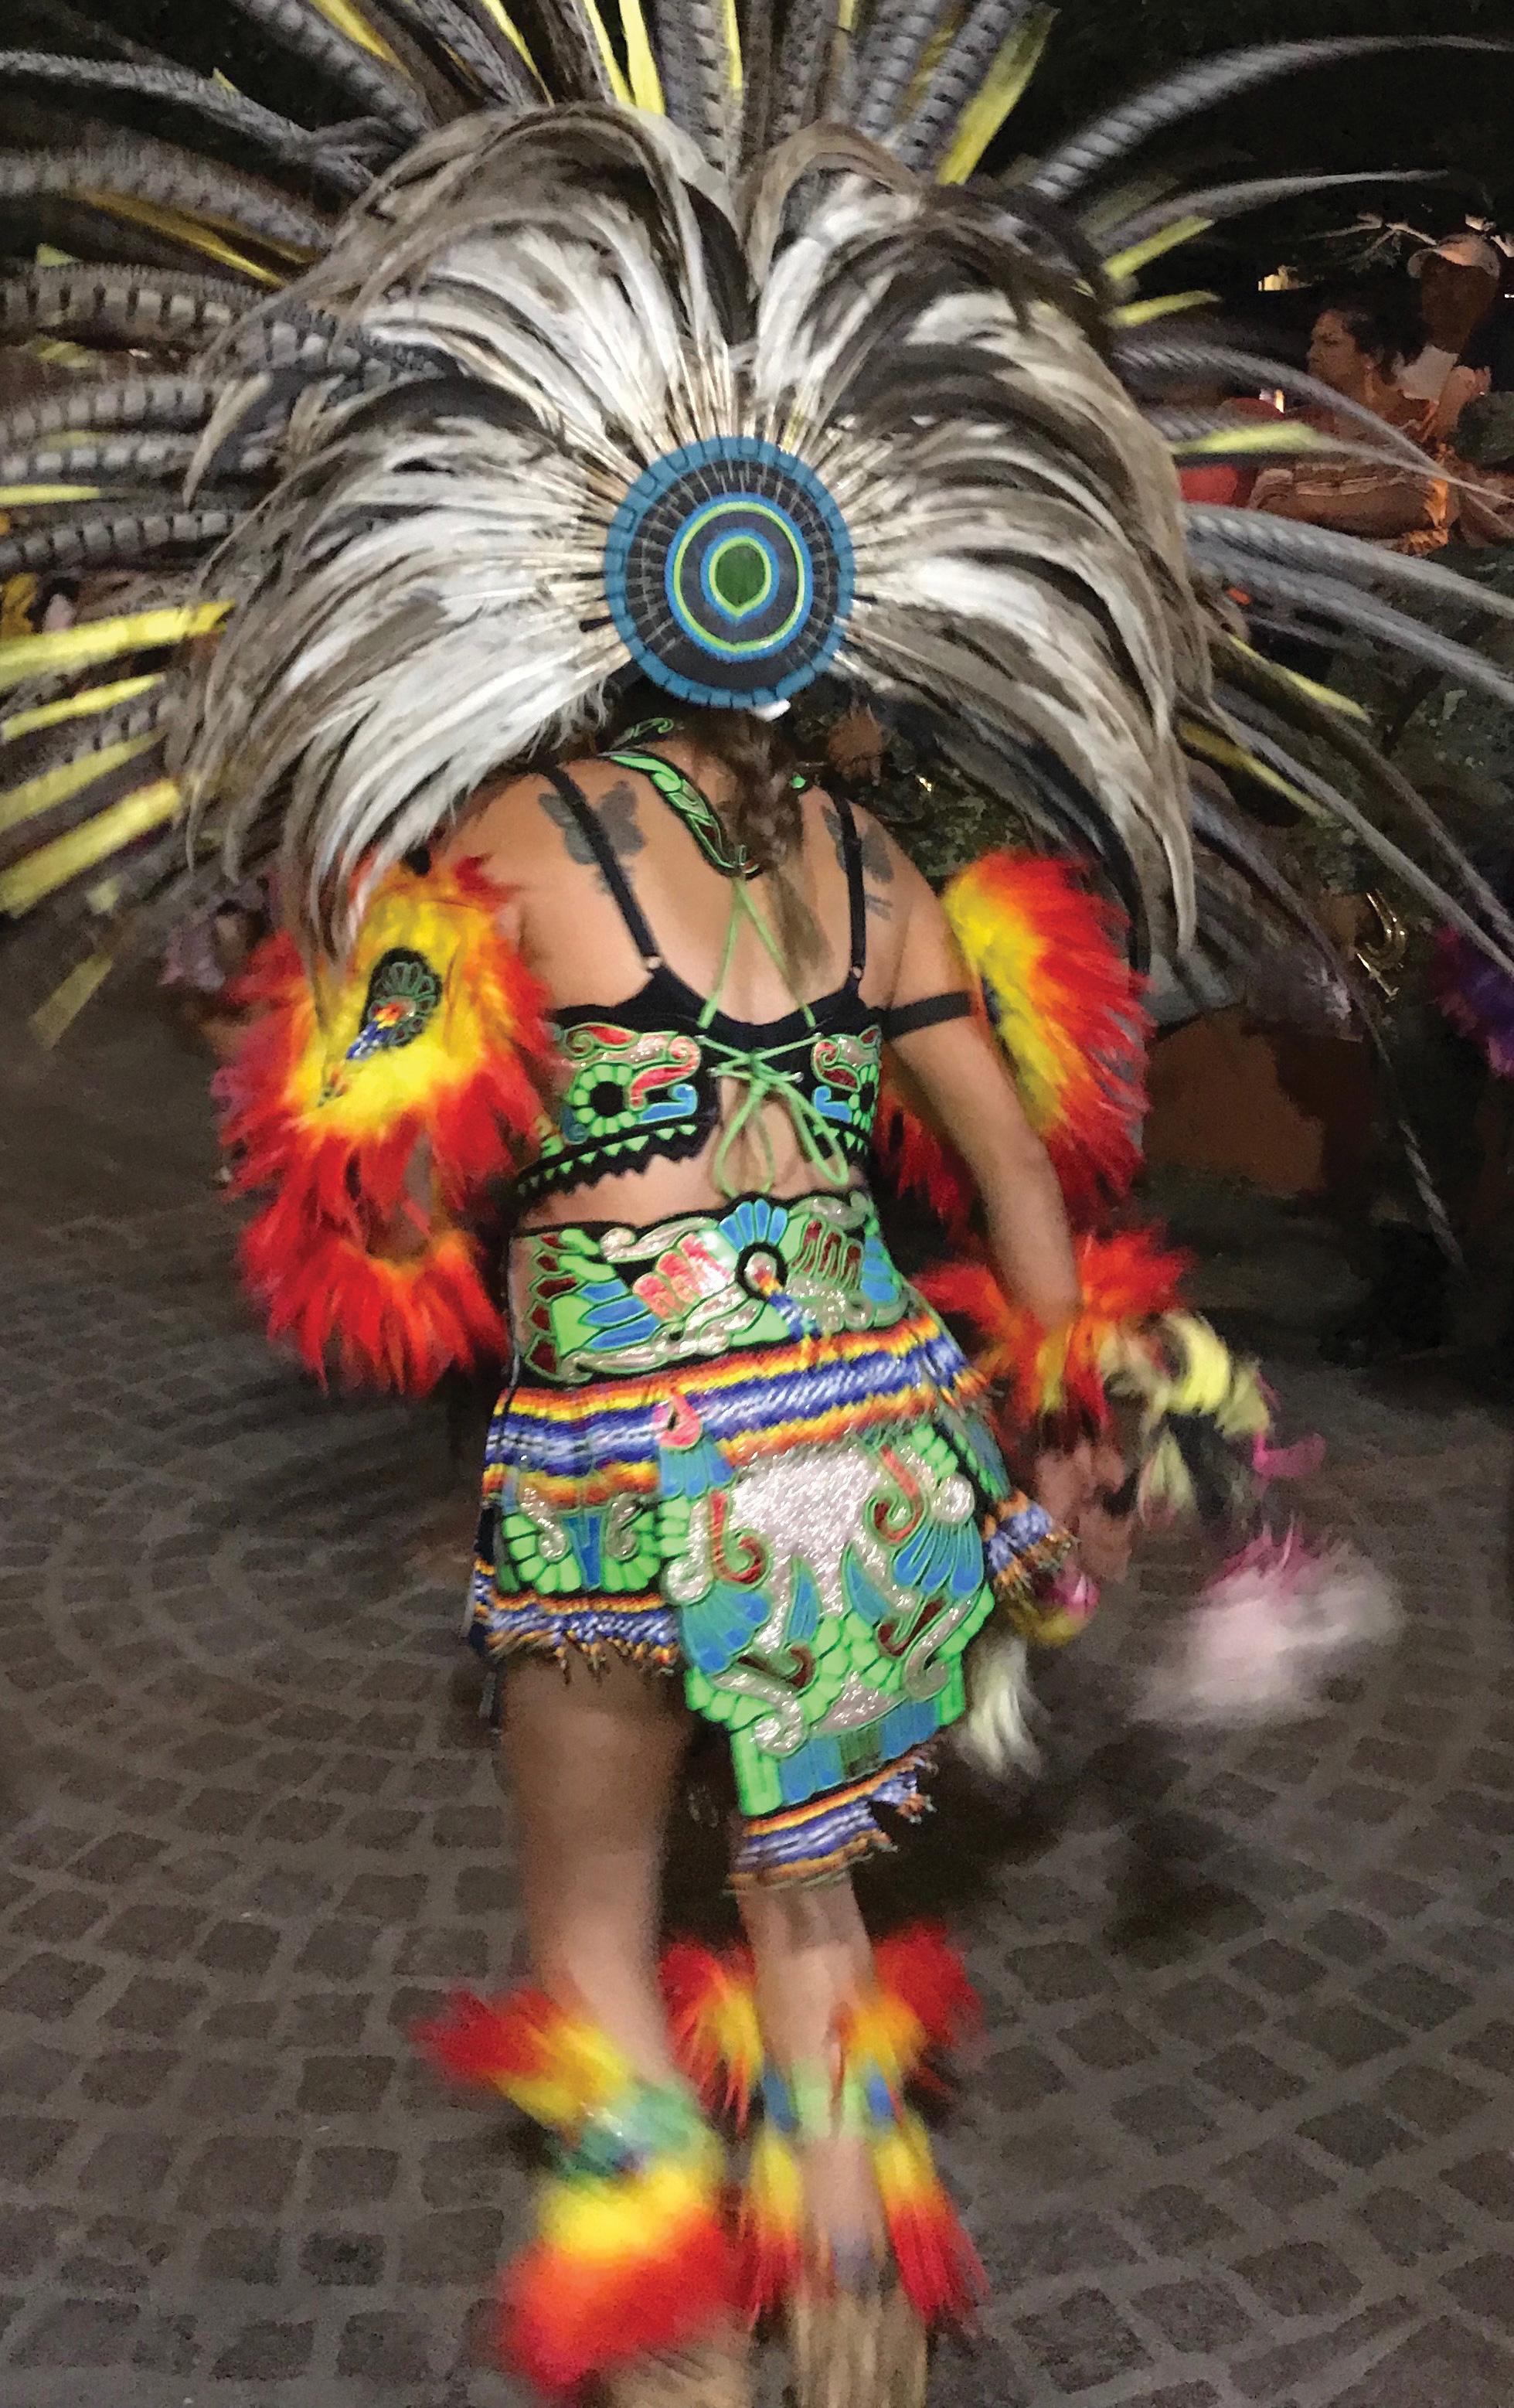 guanajuato city mexico street performer